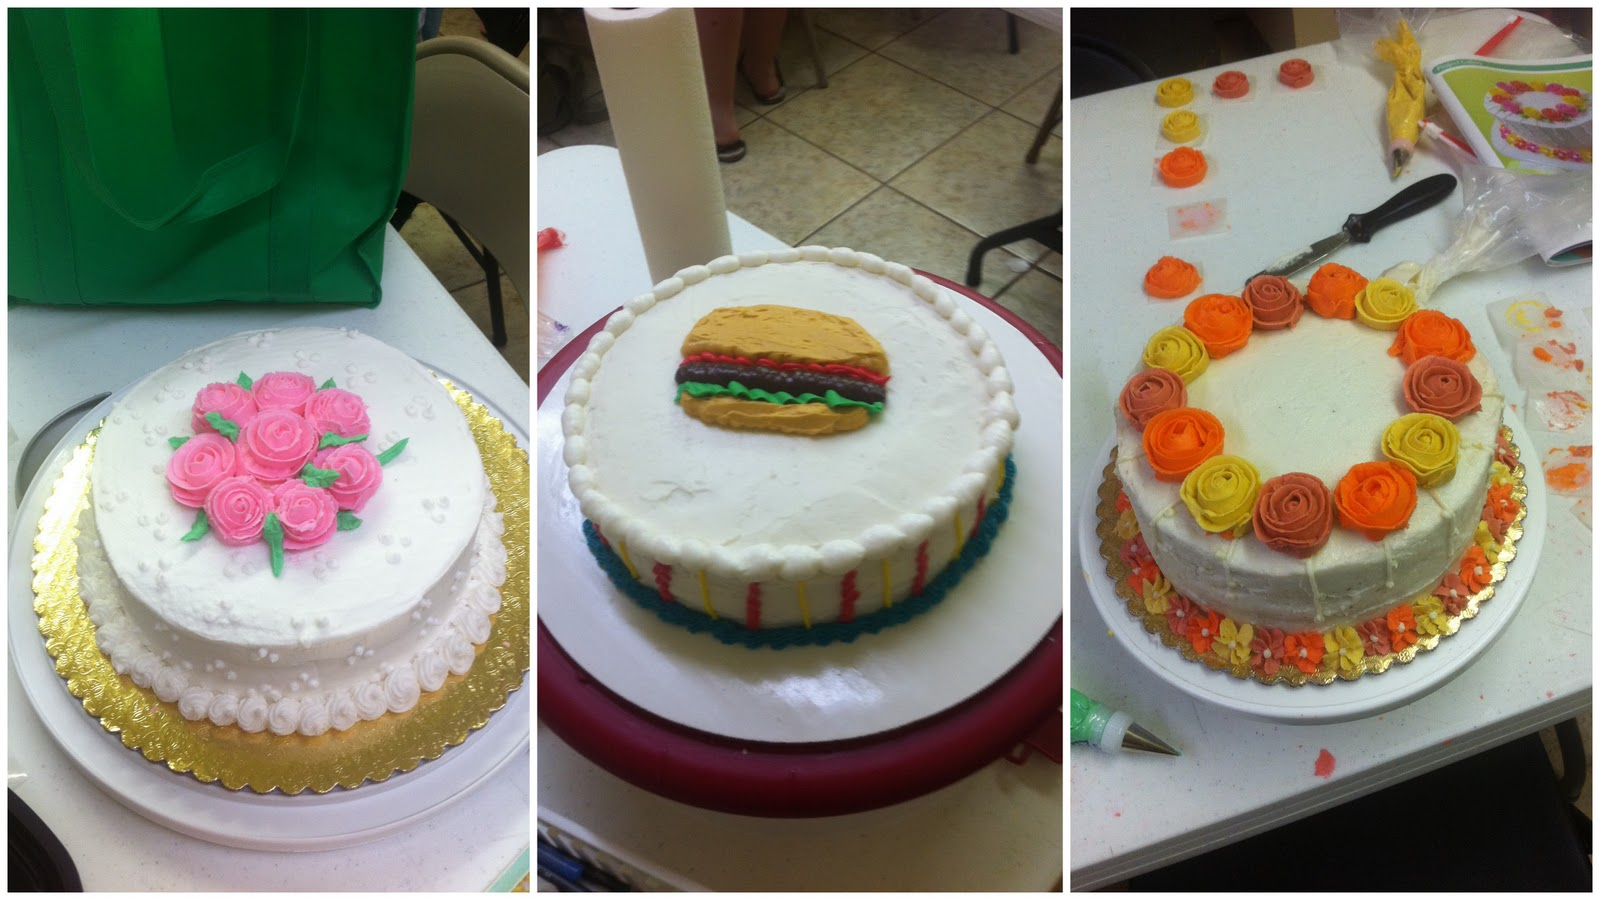 Cake Decorating Class Hk : A Gurley Gurl: Cake Decorating Class - Part 3